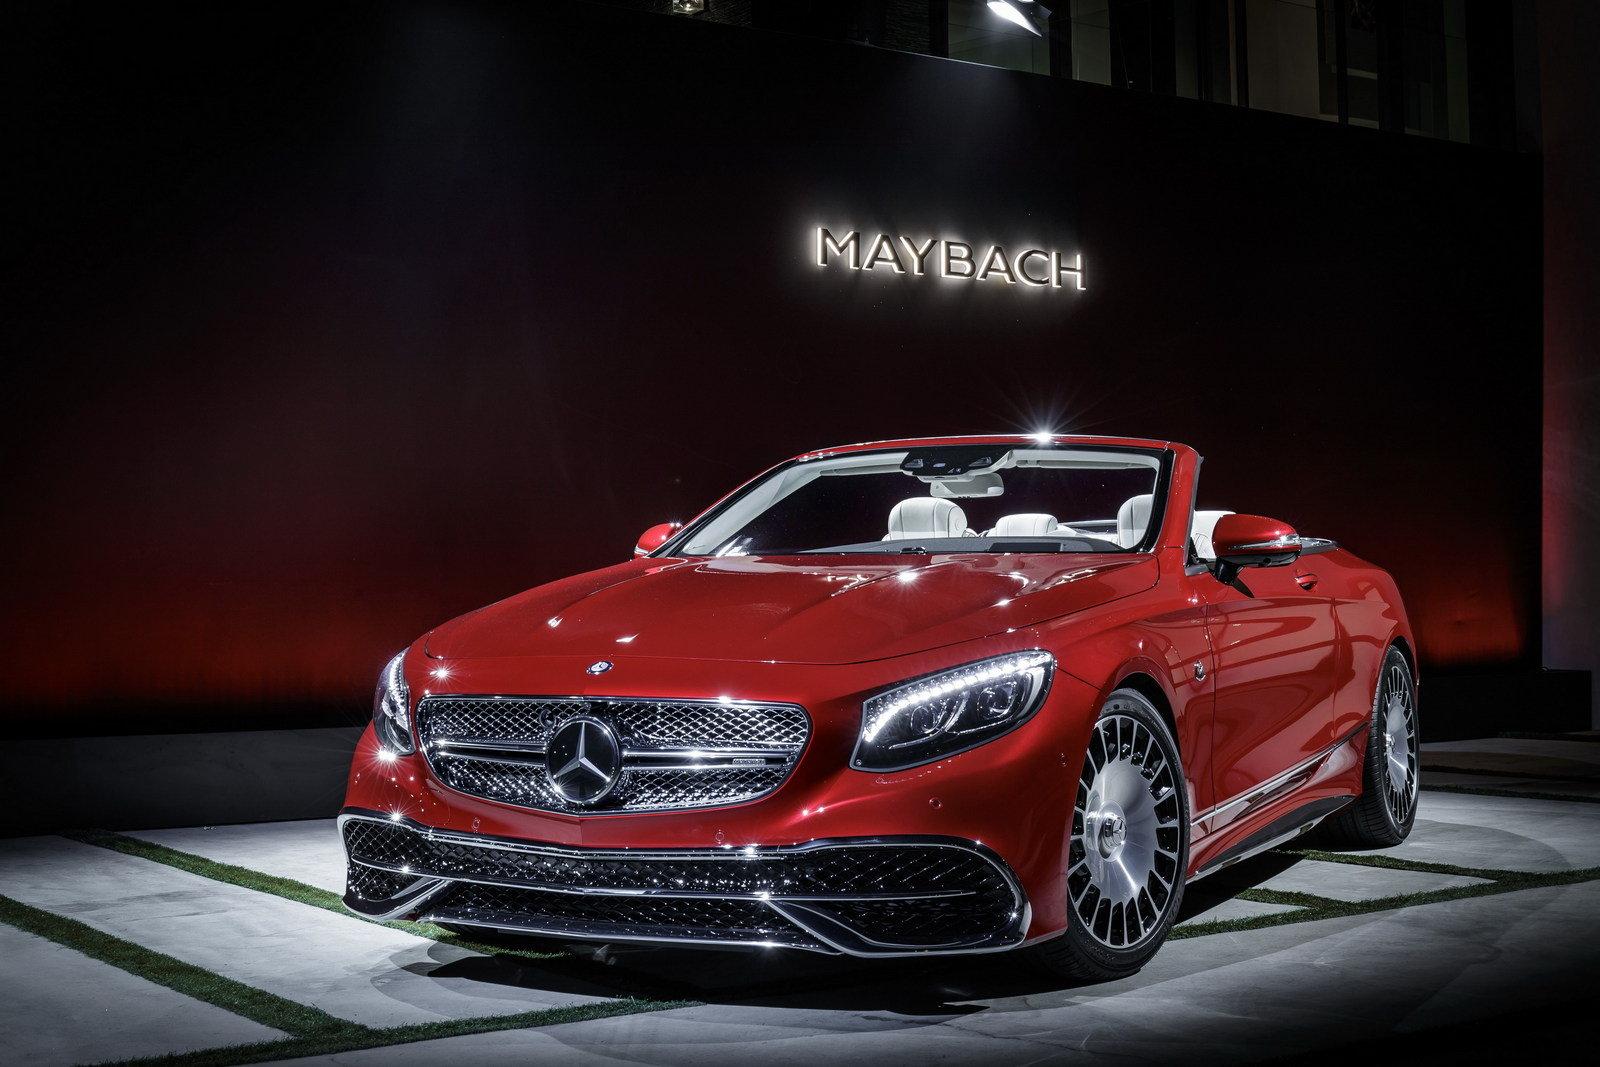 2018 Mercedes-Maybach S650 Cabriolet